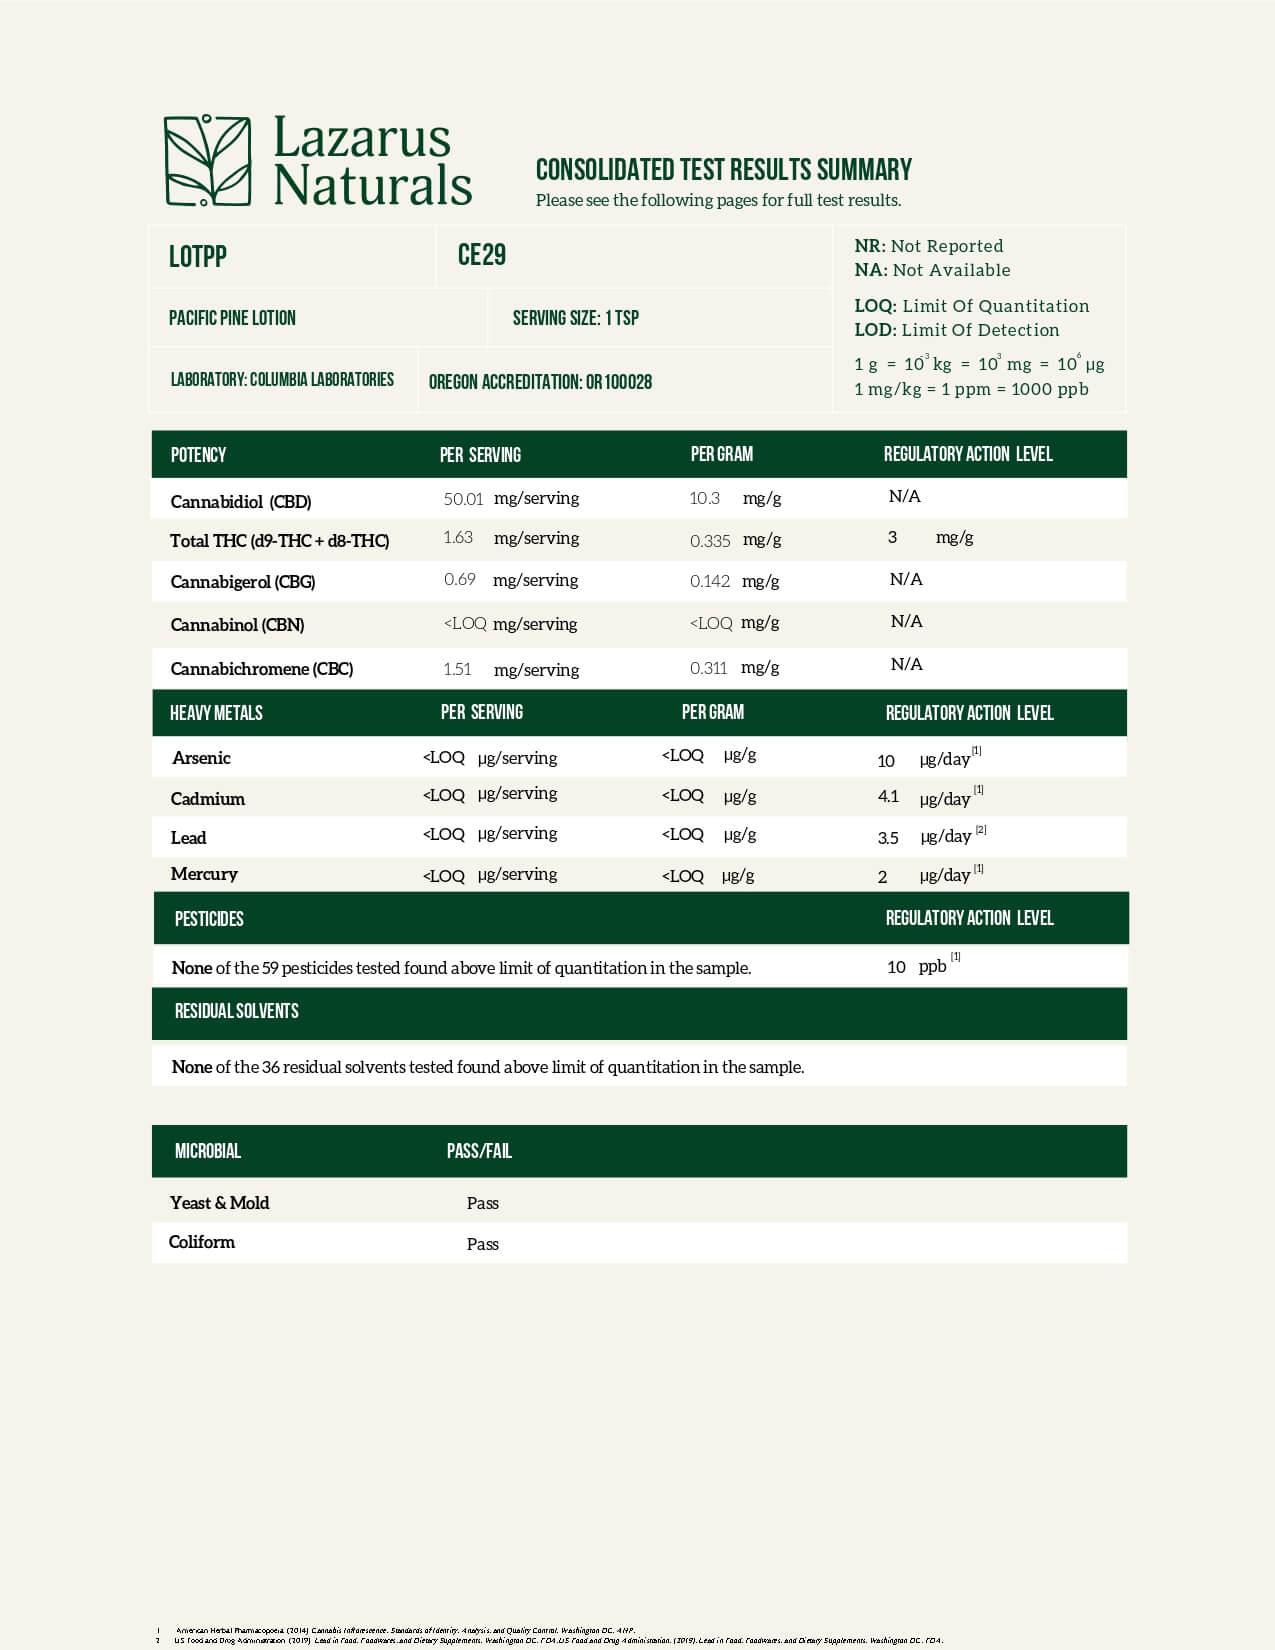 Lazarus Naturals CBD Topical Pacific Pine Lotion Lab Report